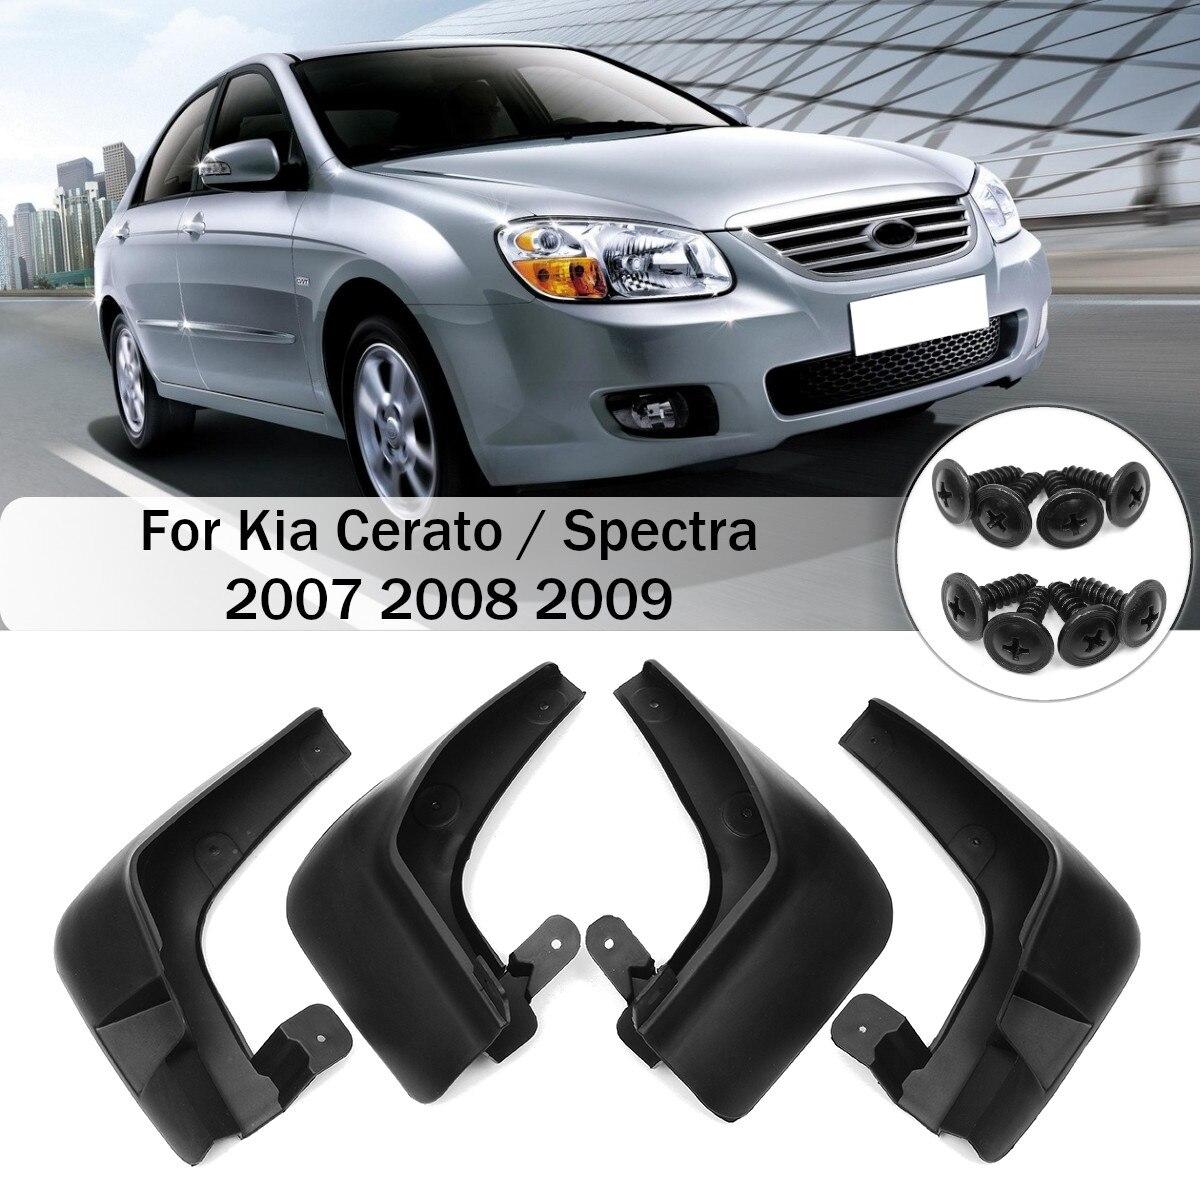 Auto 7 Auto Trans Shifter Cable Fits 2009-07 Kia SPECTRA